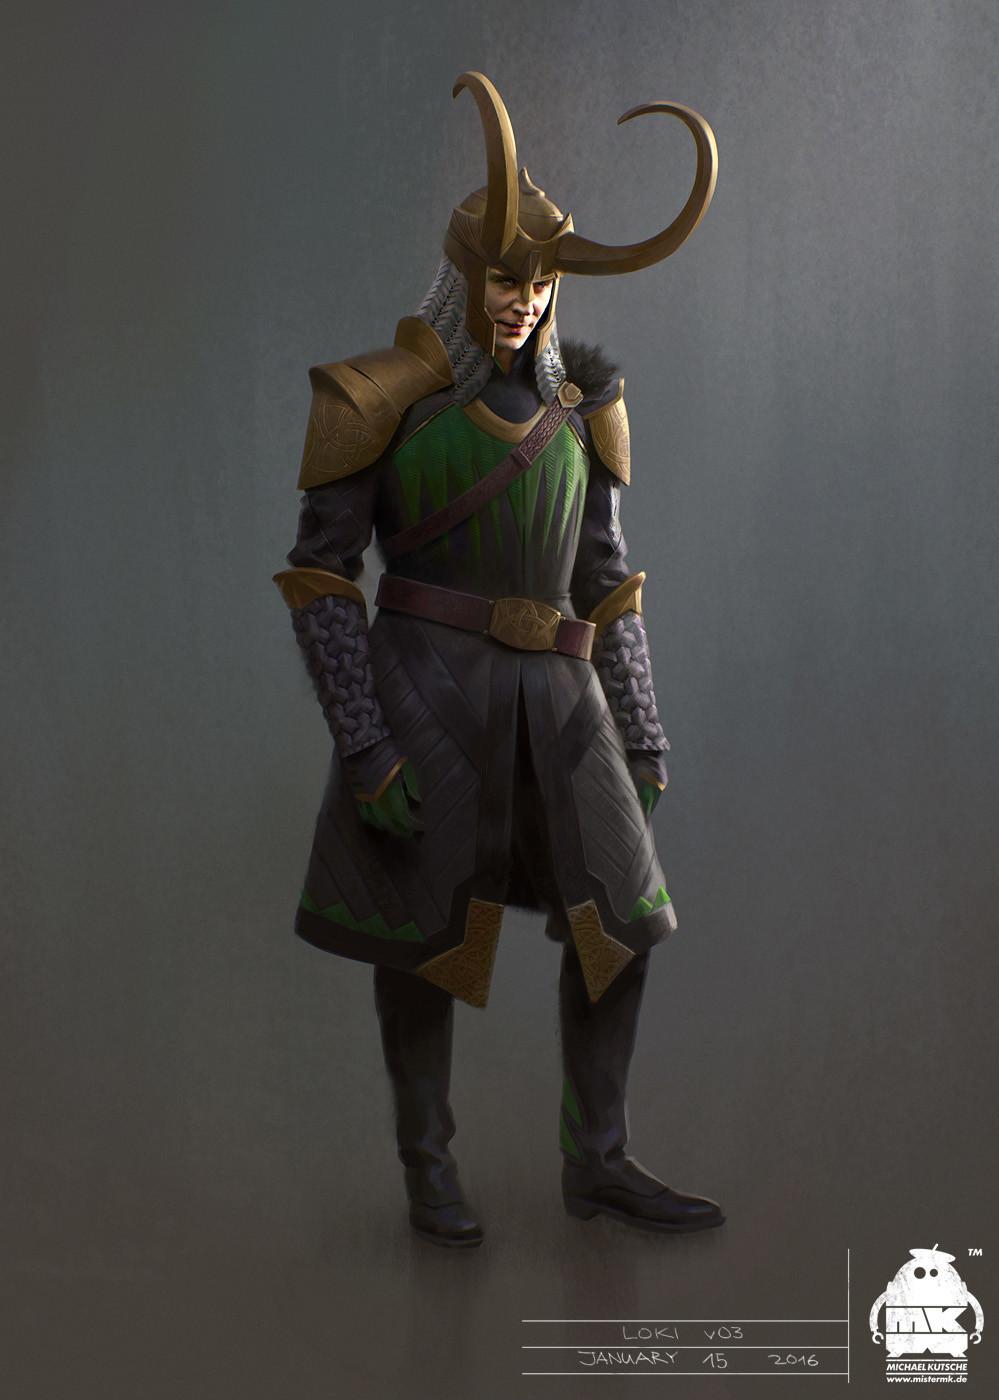 Loki Thor Ragnarok Concept Art